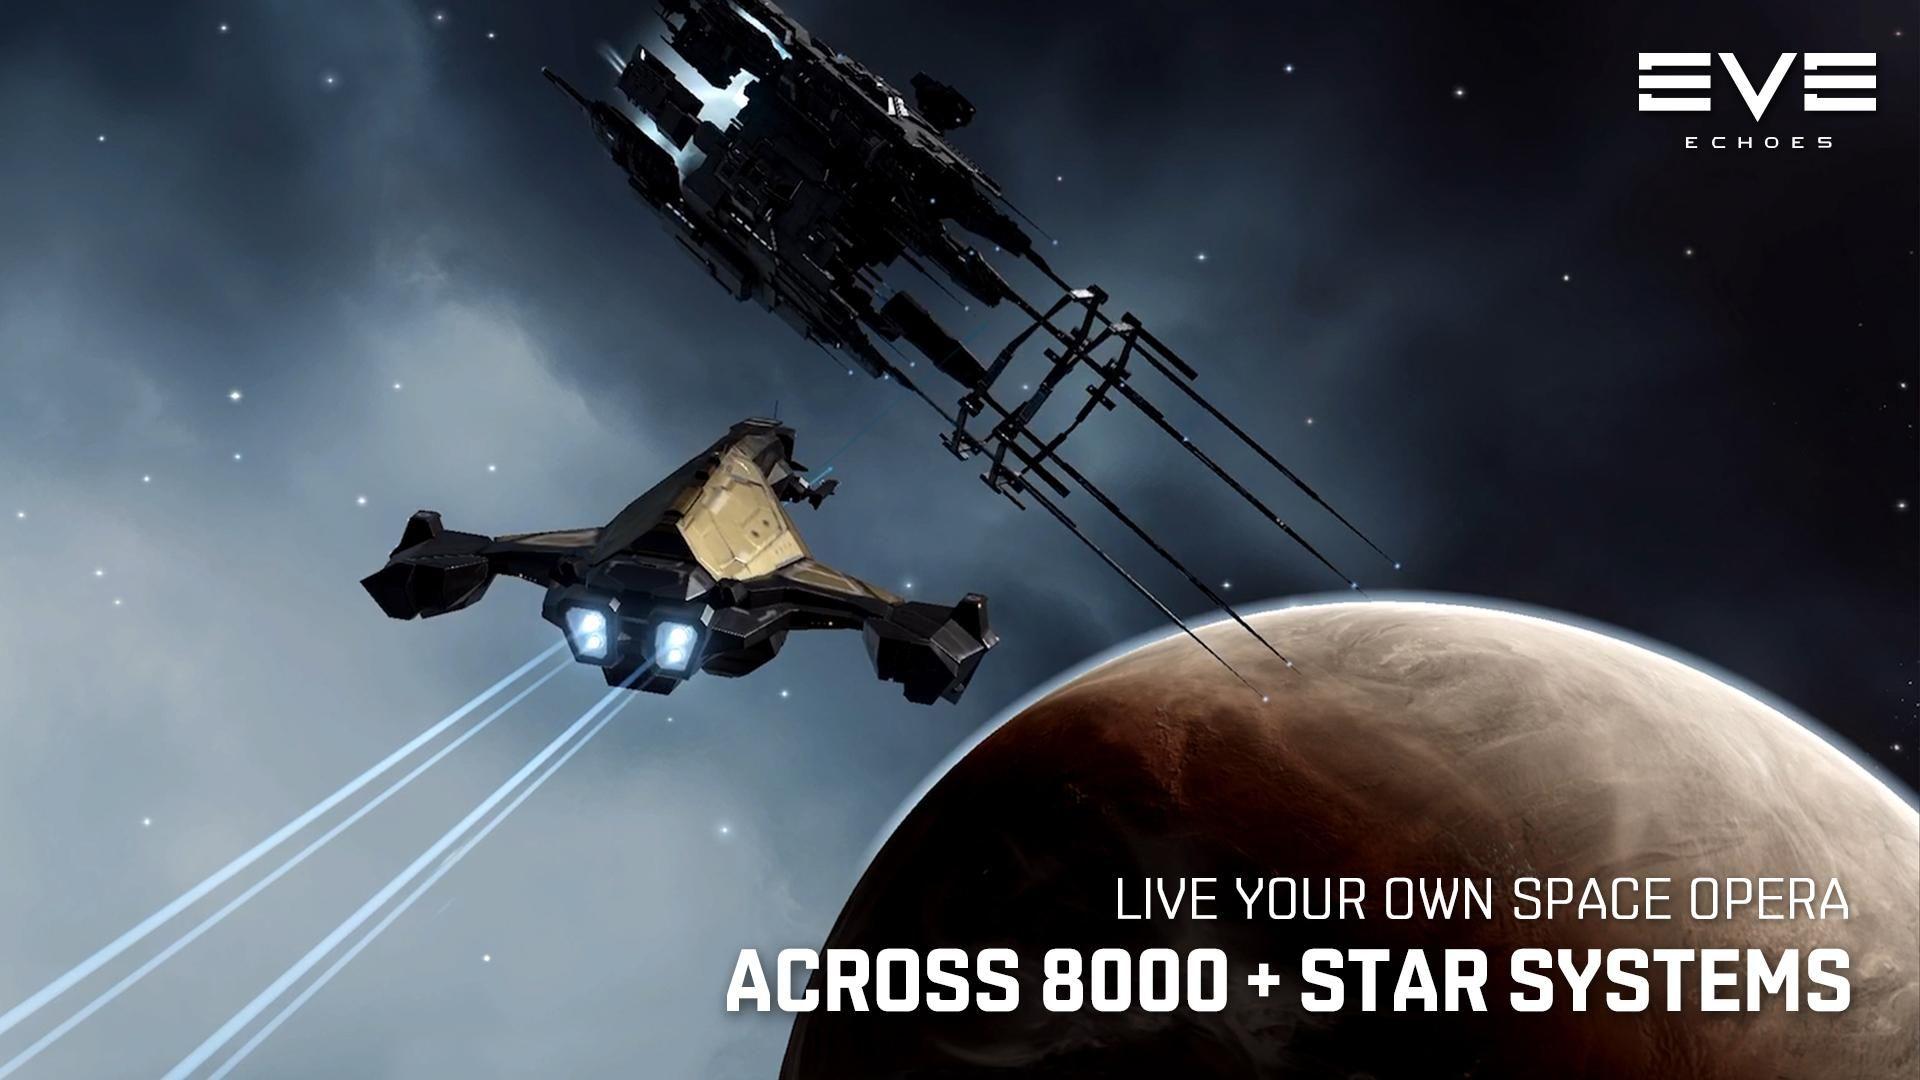 EVE星战前夜:无烬星河(美服 测试版) 游戏截图2